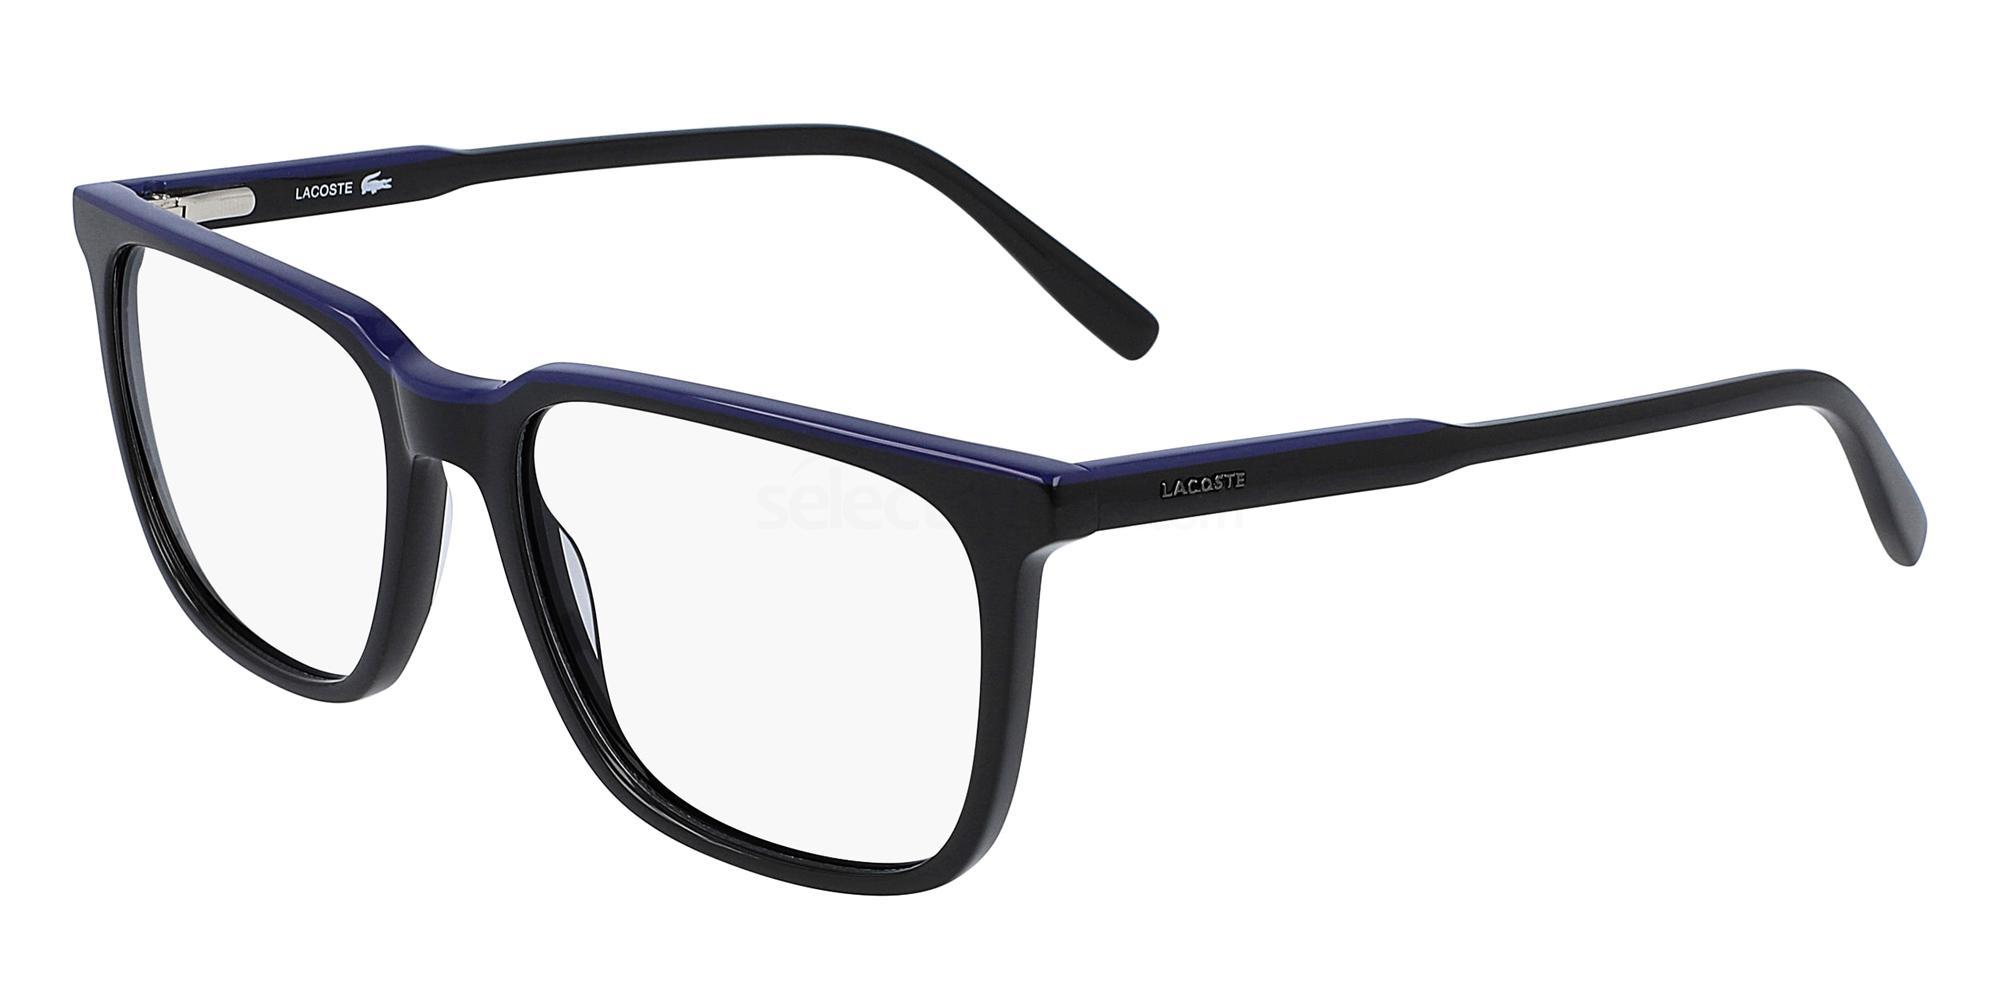 002 L2861 Glasses, Lacoste